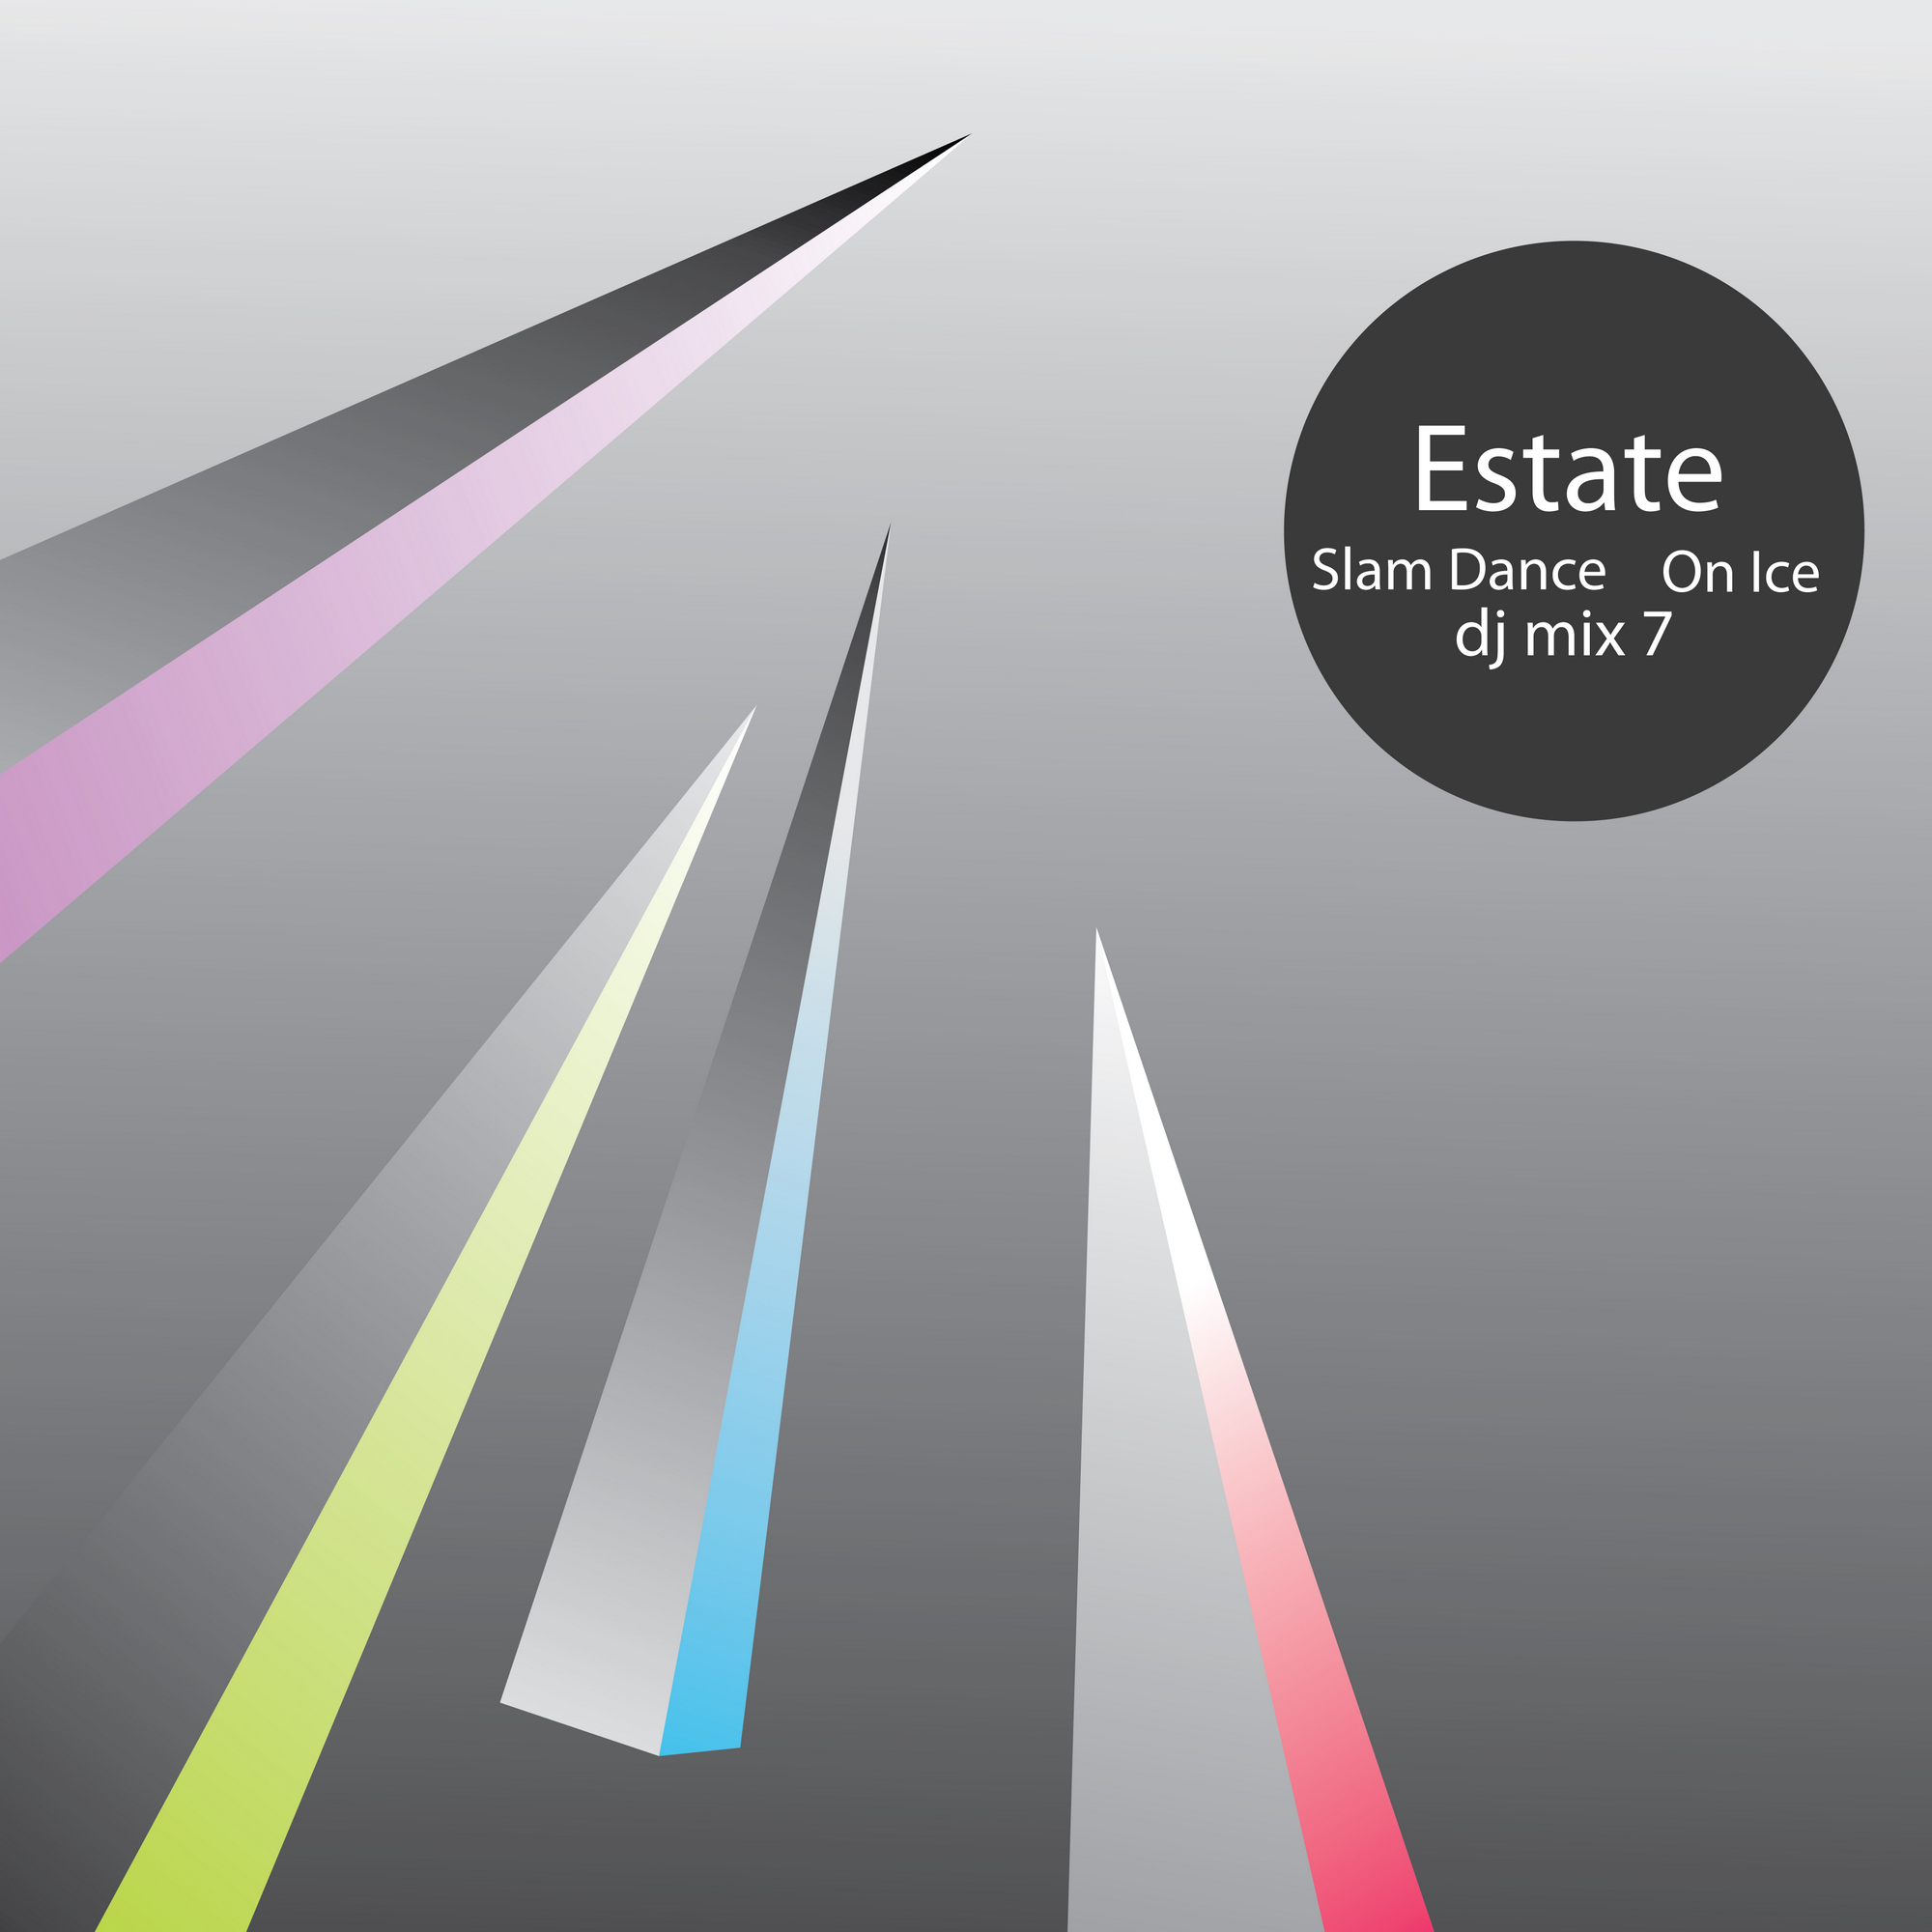 estate slam on ice 2010 mix 7-04.jpg